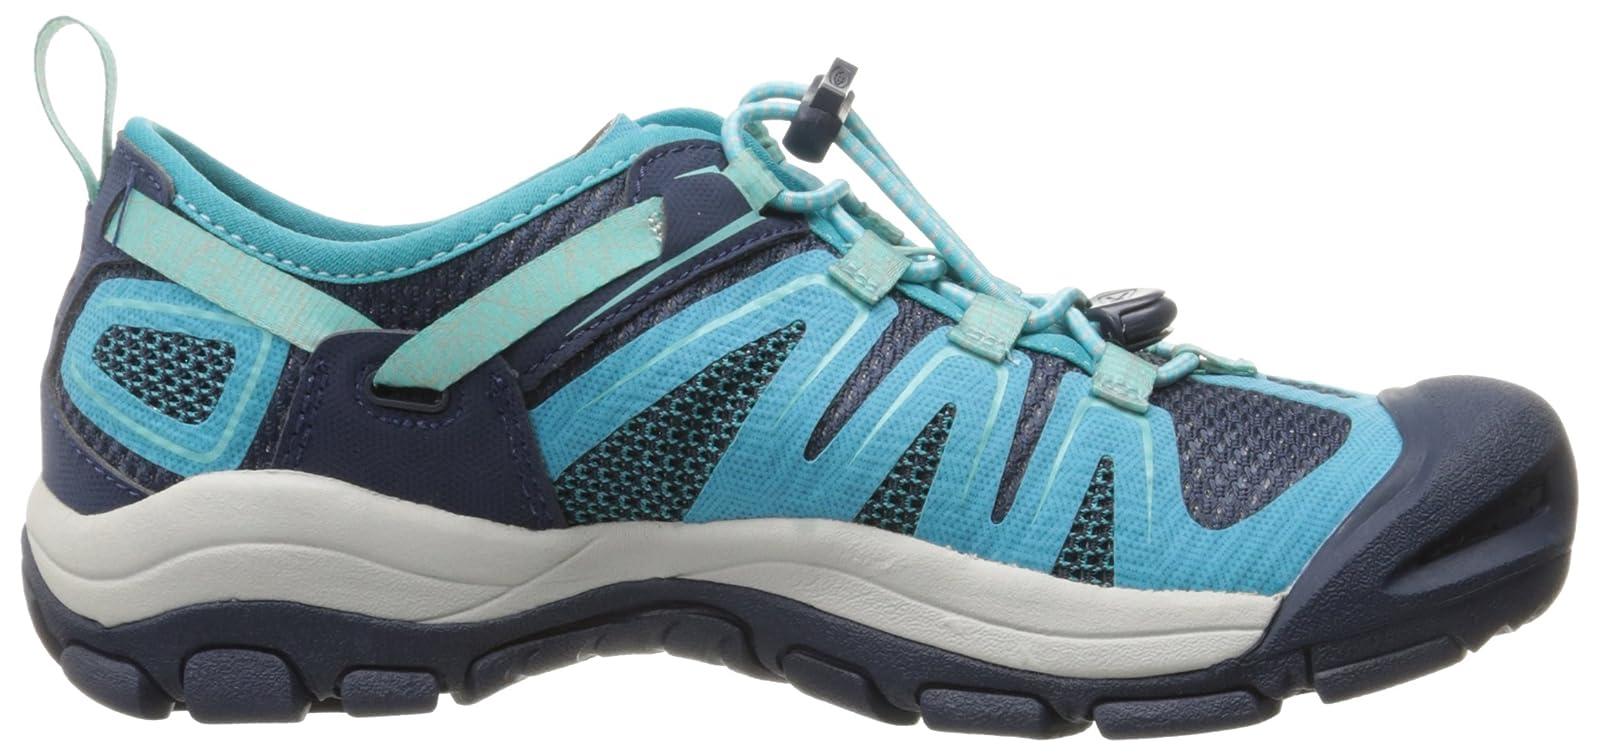 KEEN Women's Mckenzie II Hiking Shoe US - 7